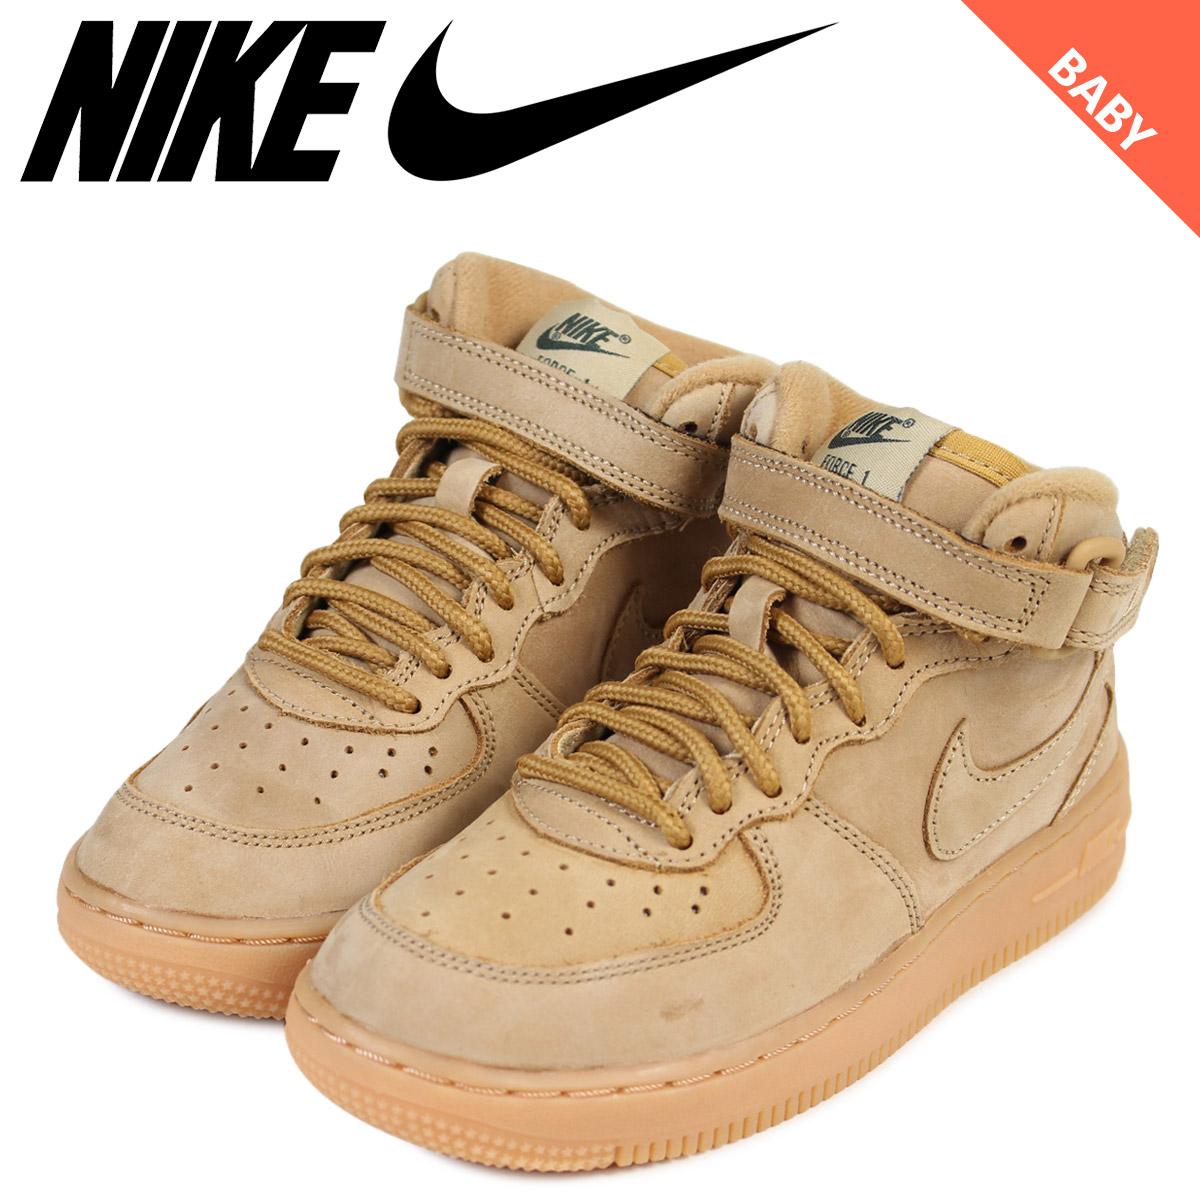 NIKE Nike air force 1 mid baby sneakers AIR FORCE 1 WB TD AH0757 203 shoes brown